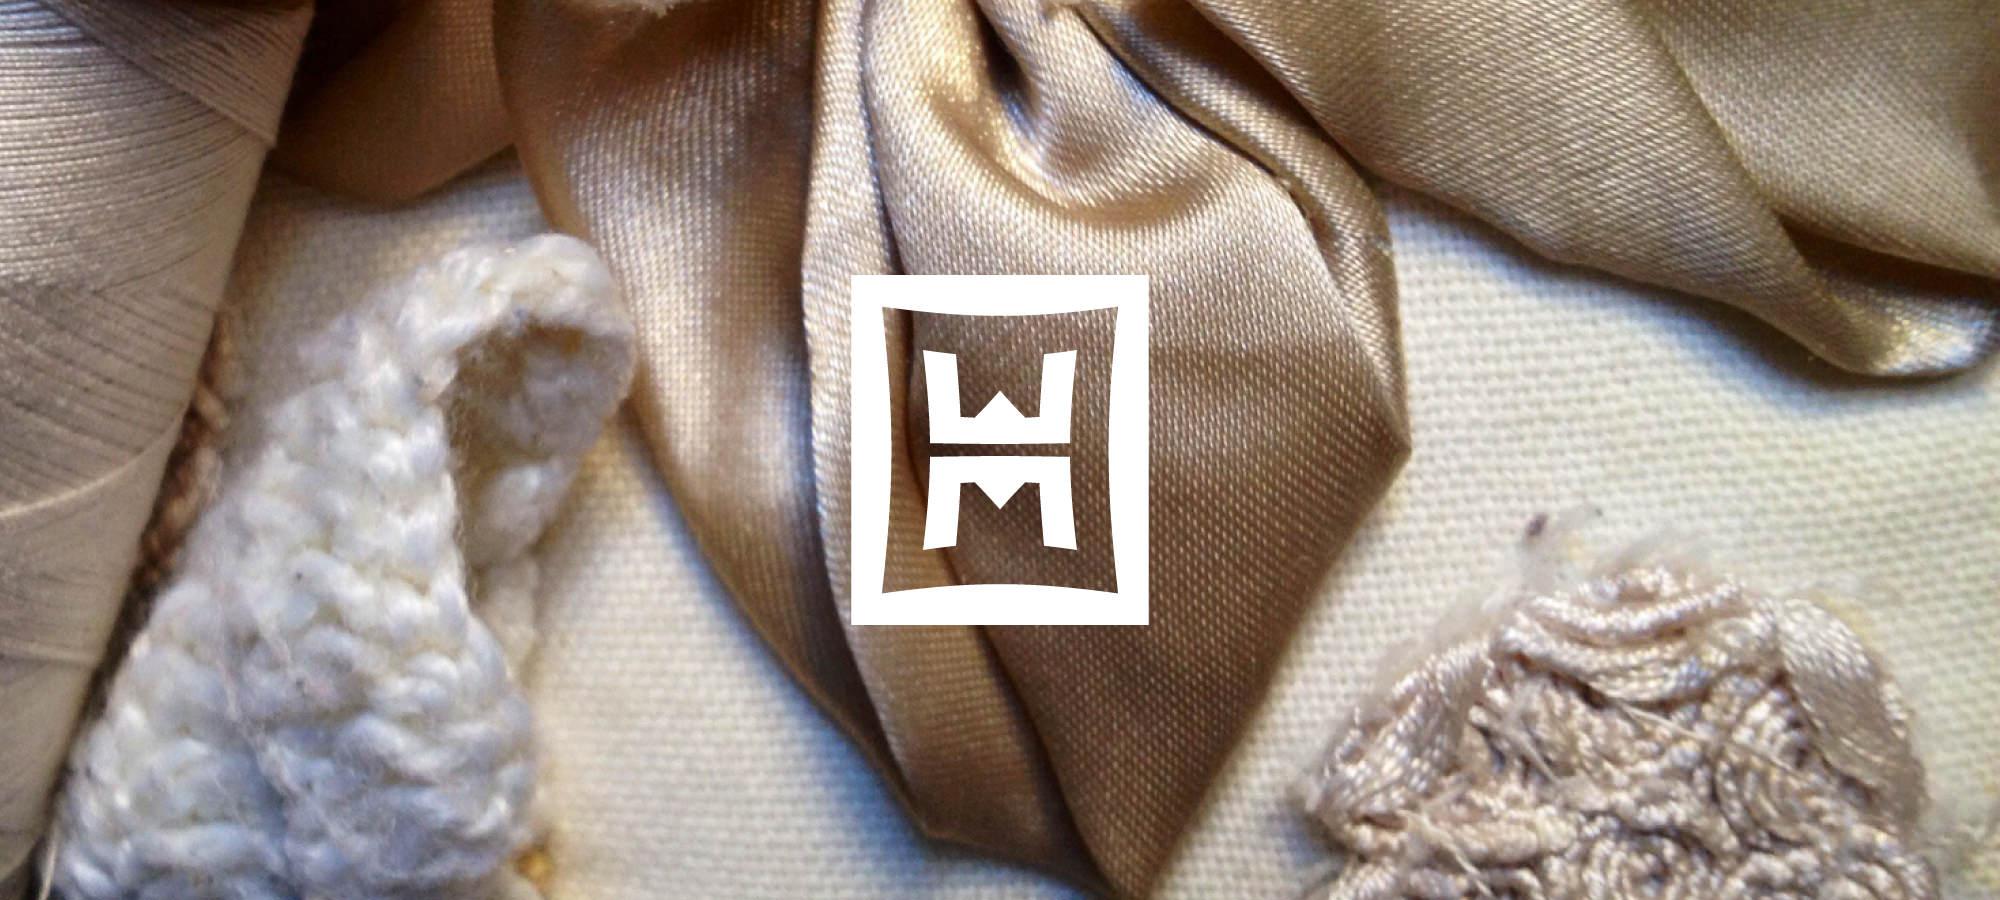 hwm-header-100